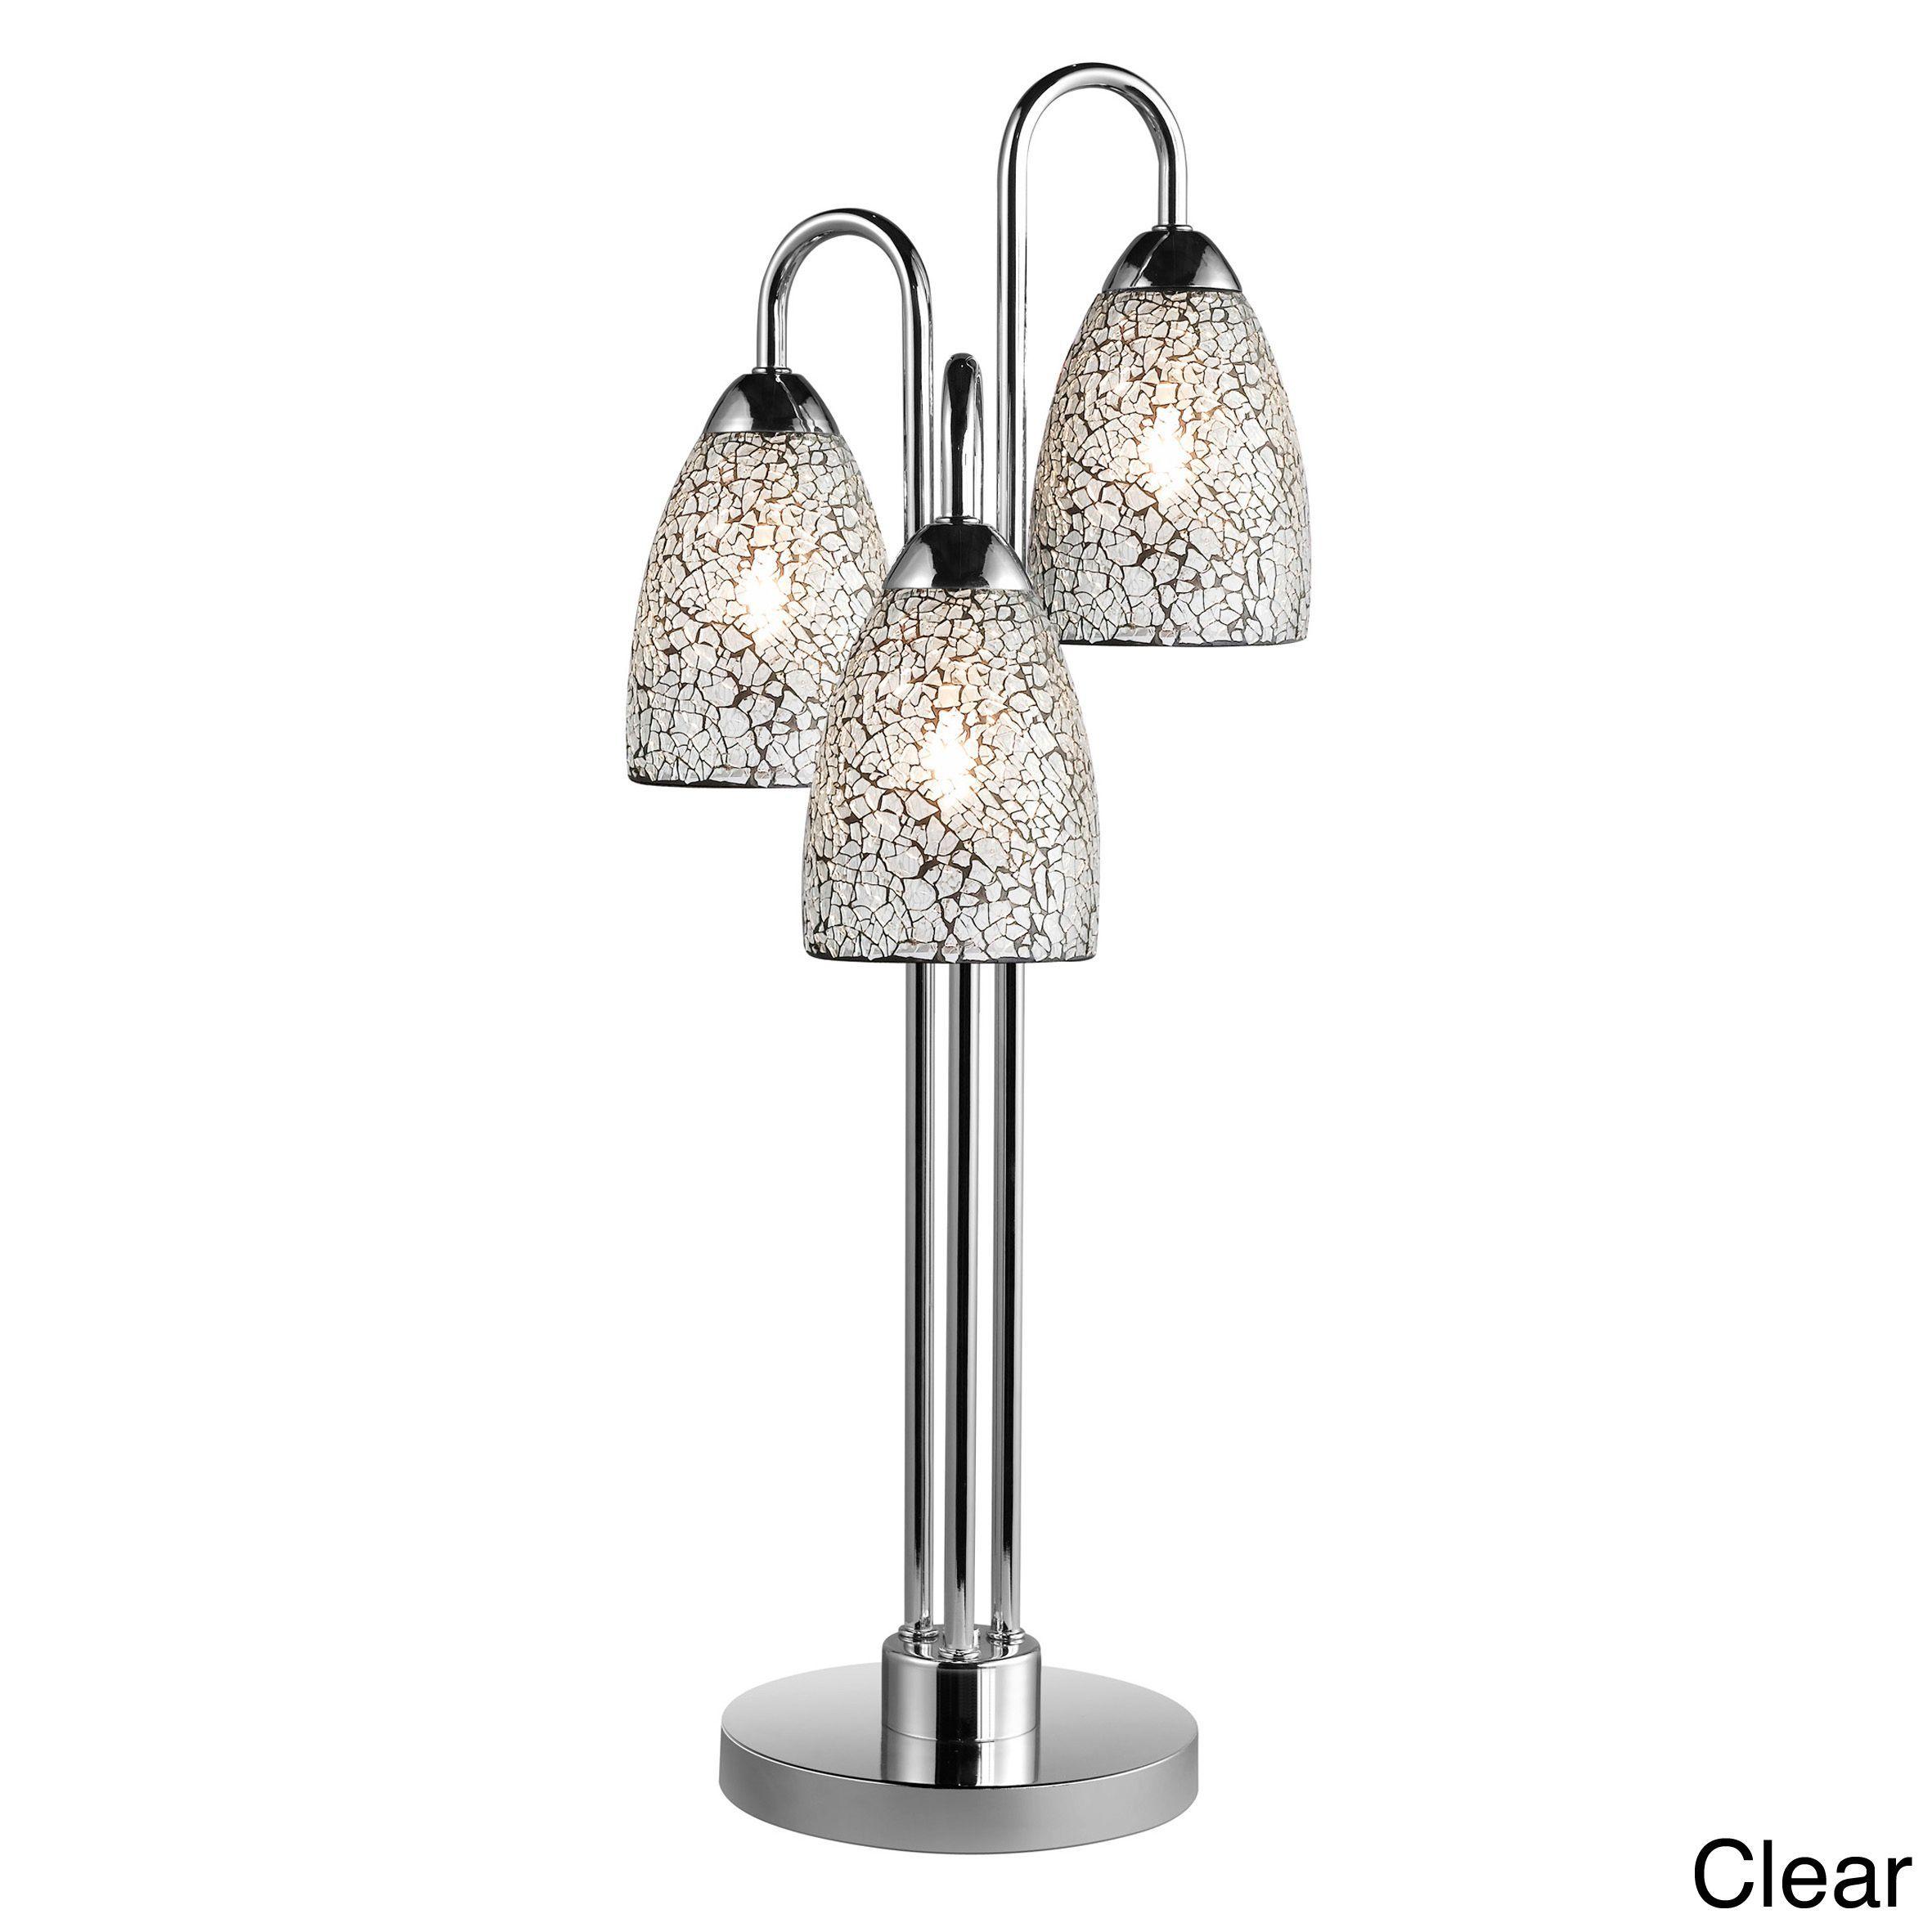 Woodbridge Lighting Venezia 3 Light Mosaic Glass/ Chrome Table Lamp (Clear)